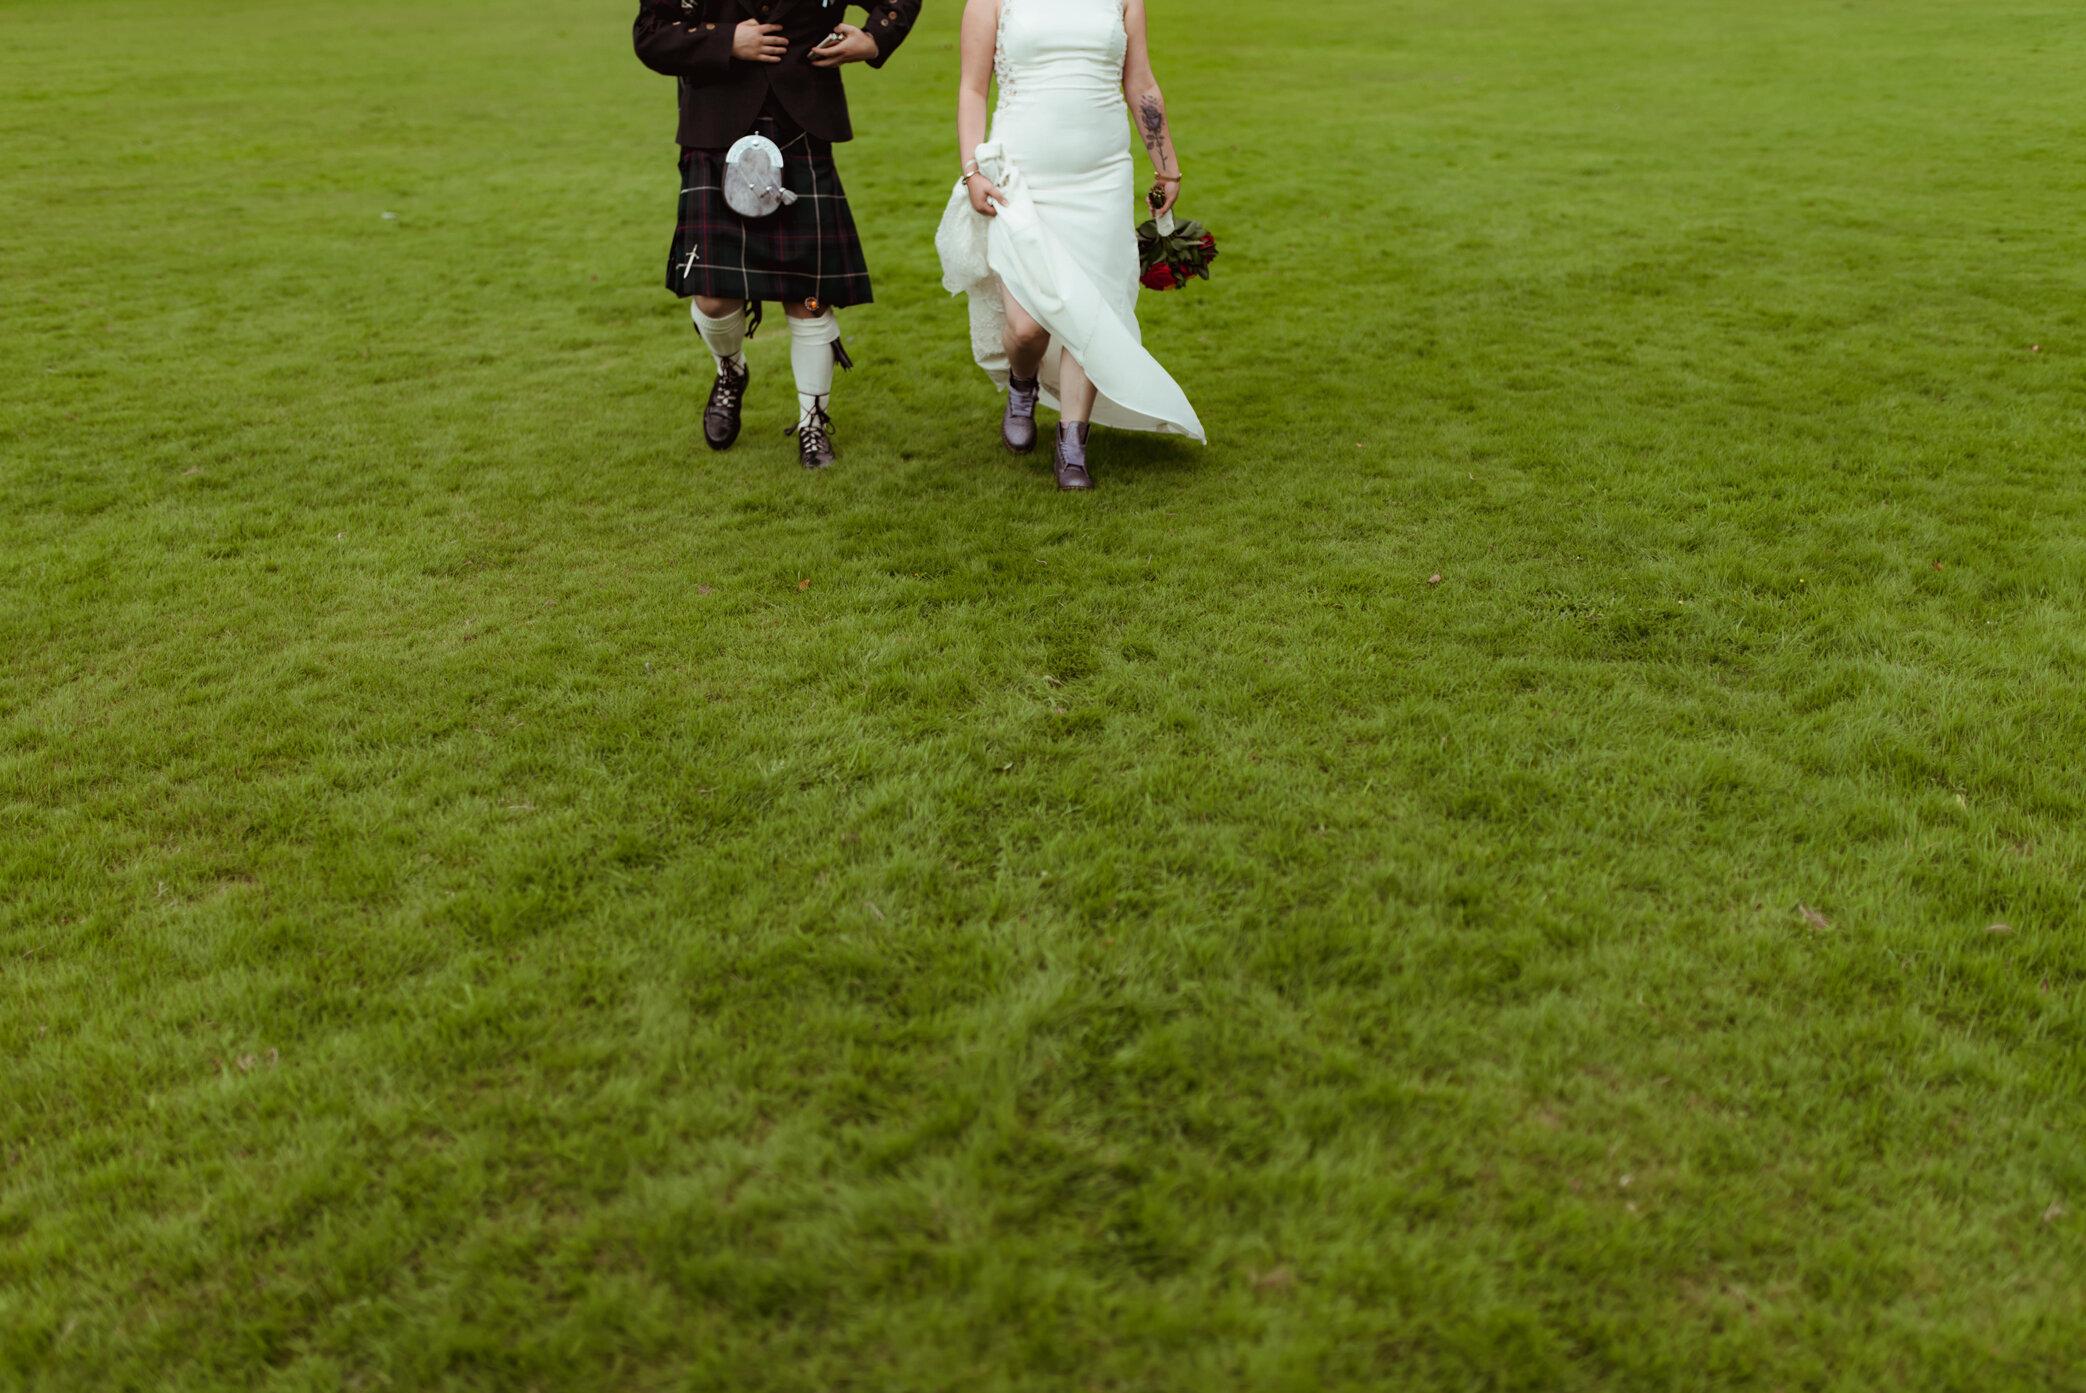 creative-wedding-photography-scotland (1).jpg